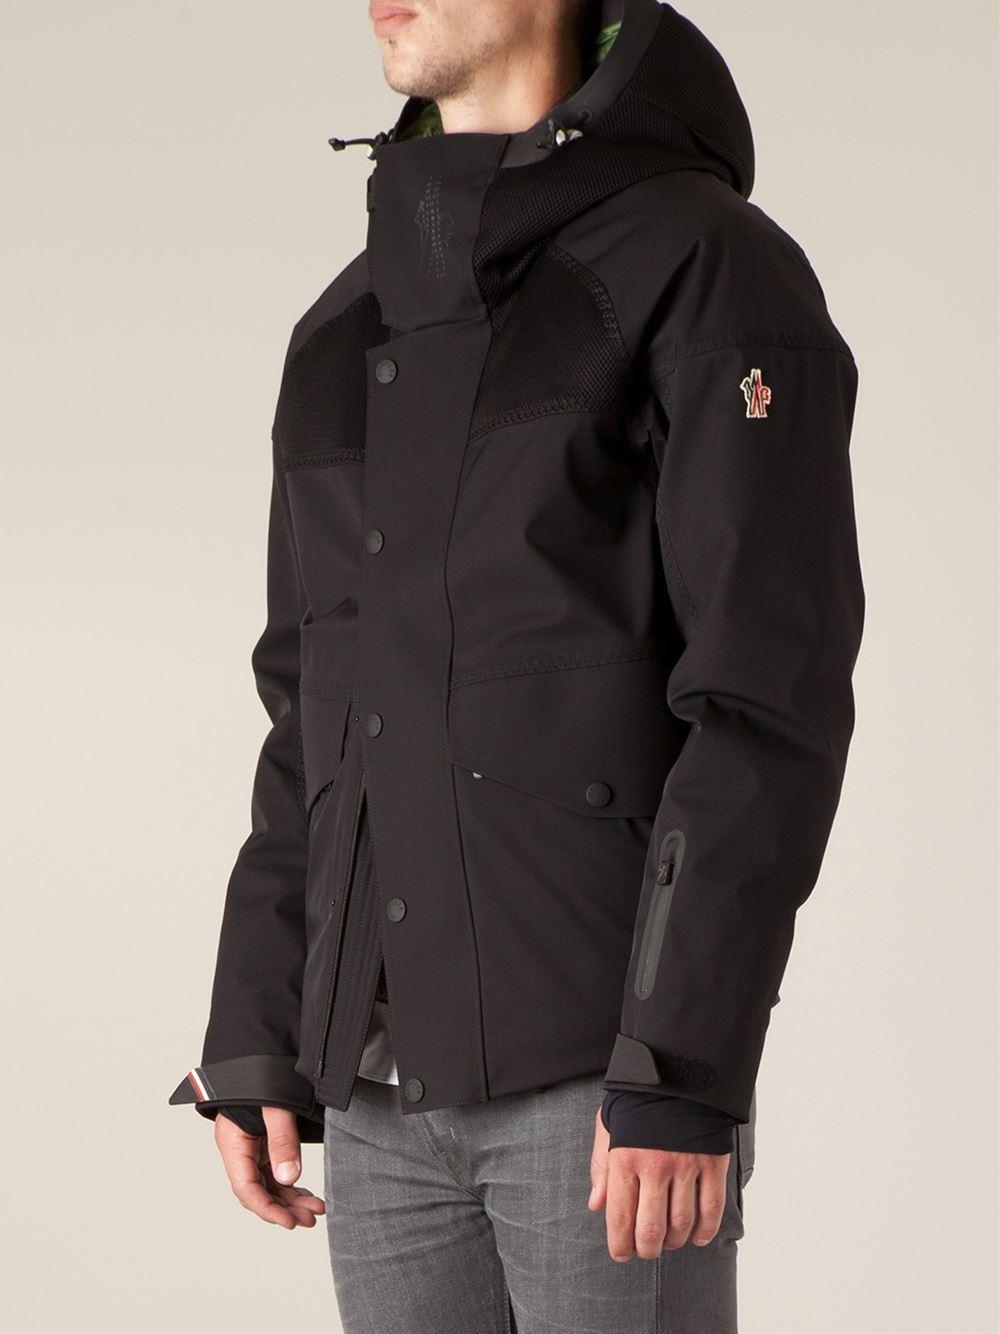 Moncler grenoble Contrasting Panels Hooded Jacket in Black ...